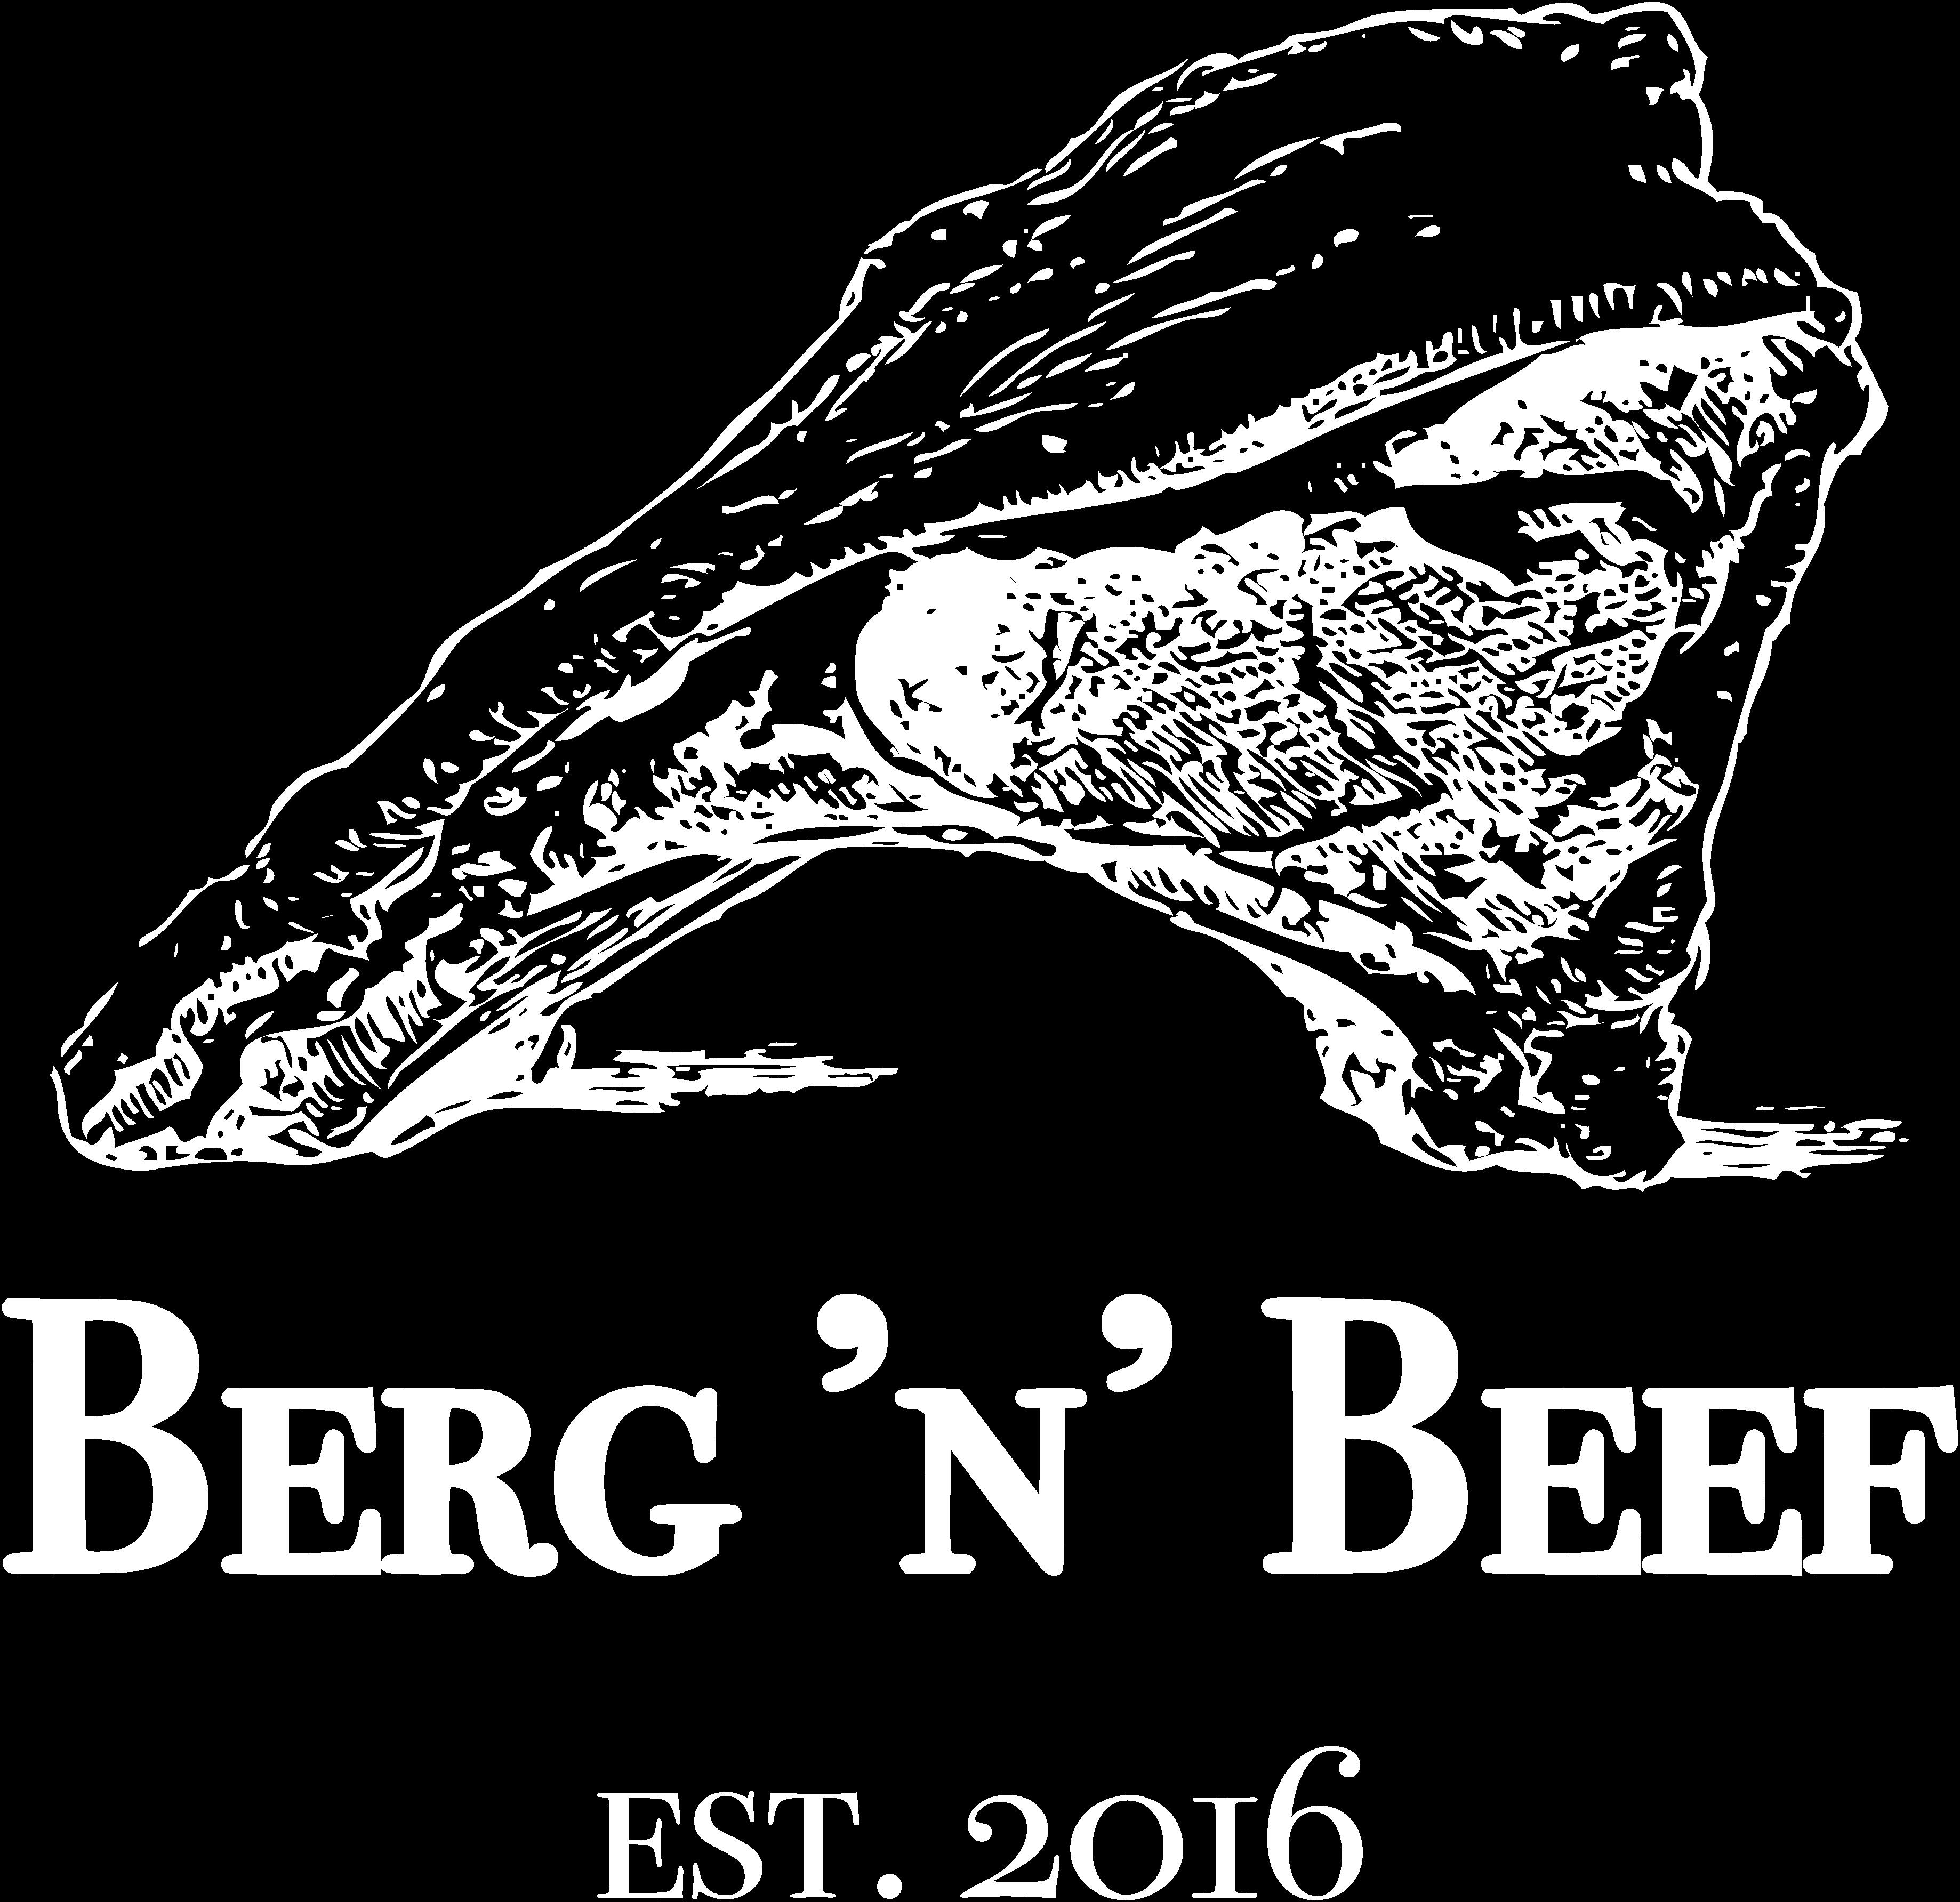 cropped-BergnBeef-Logo-Negativ@4x.png